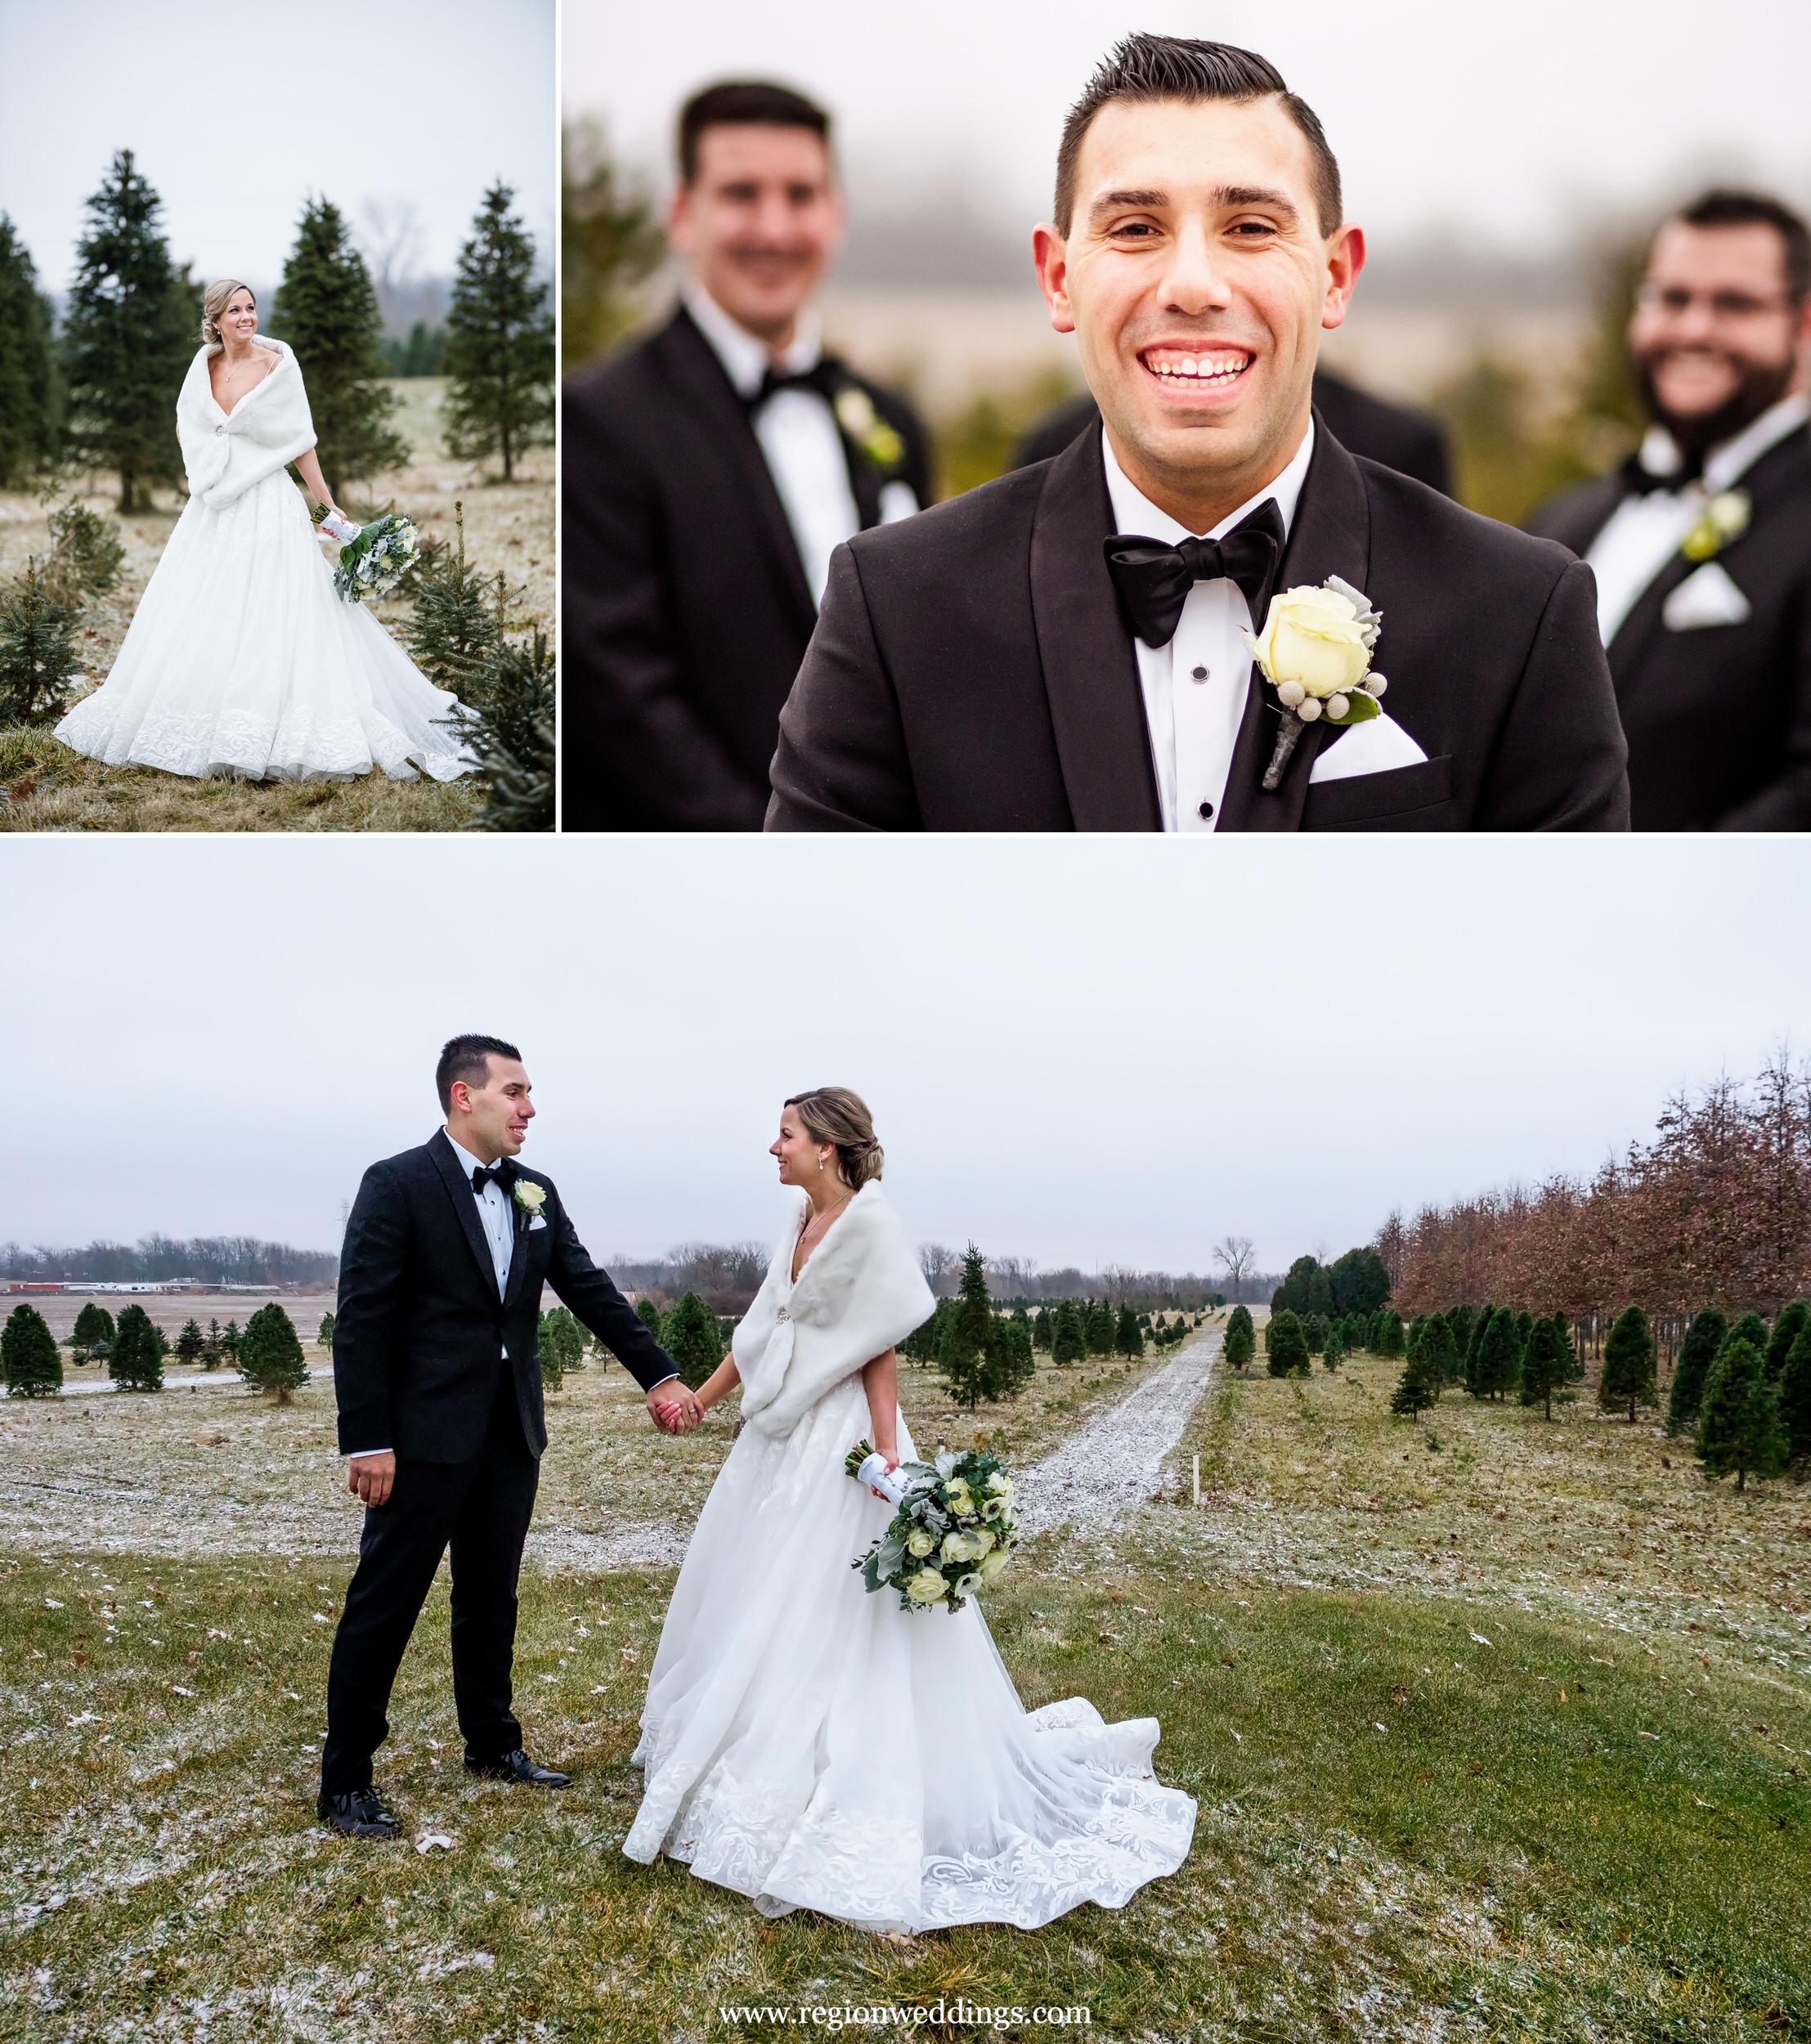 Winter wedding photos at Kapitan Nursery tree farm.